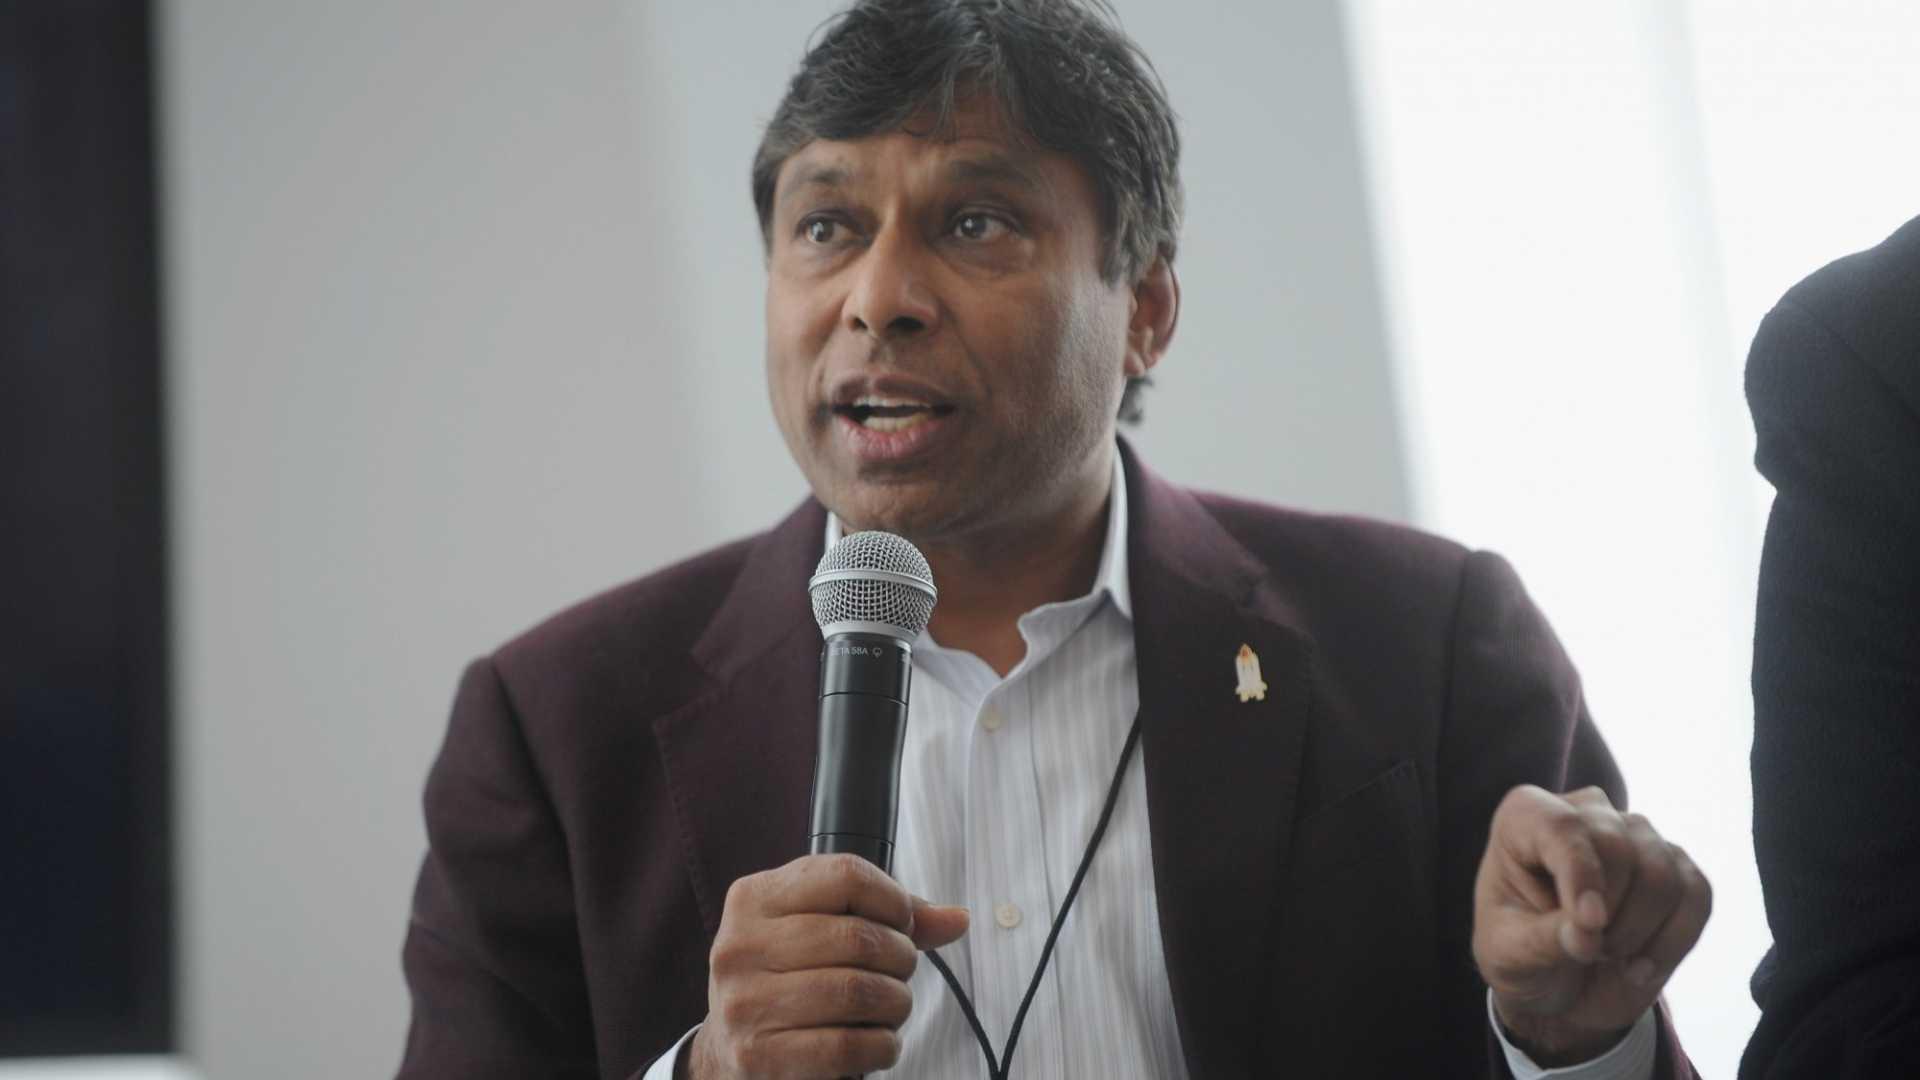 Serial Entrepreneur Naveen Jain Says to Succeed, You Must Ask Dumb Questions